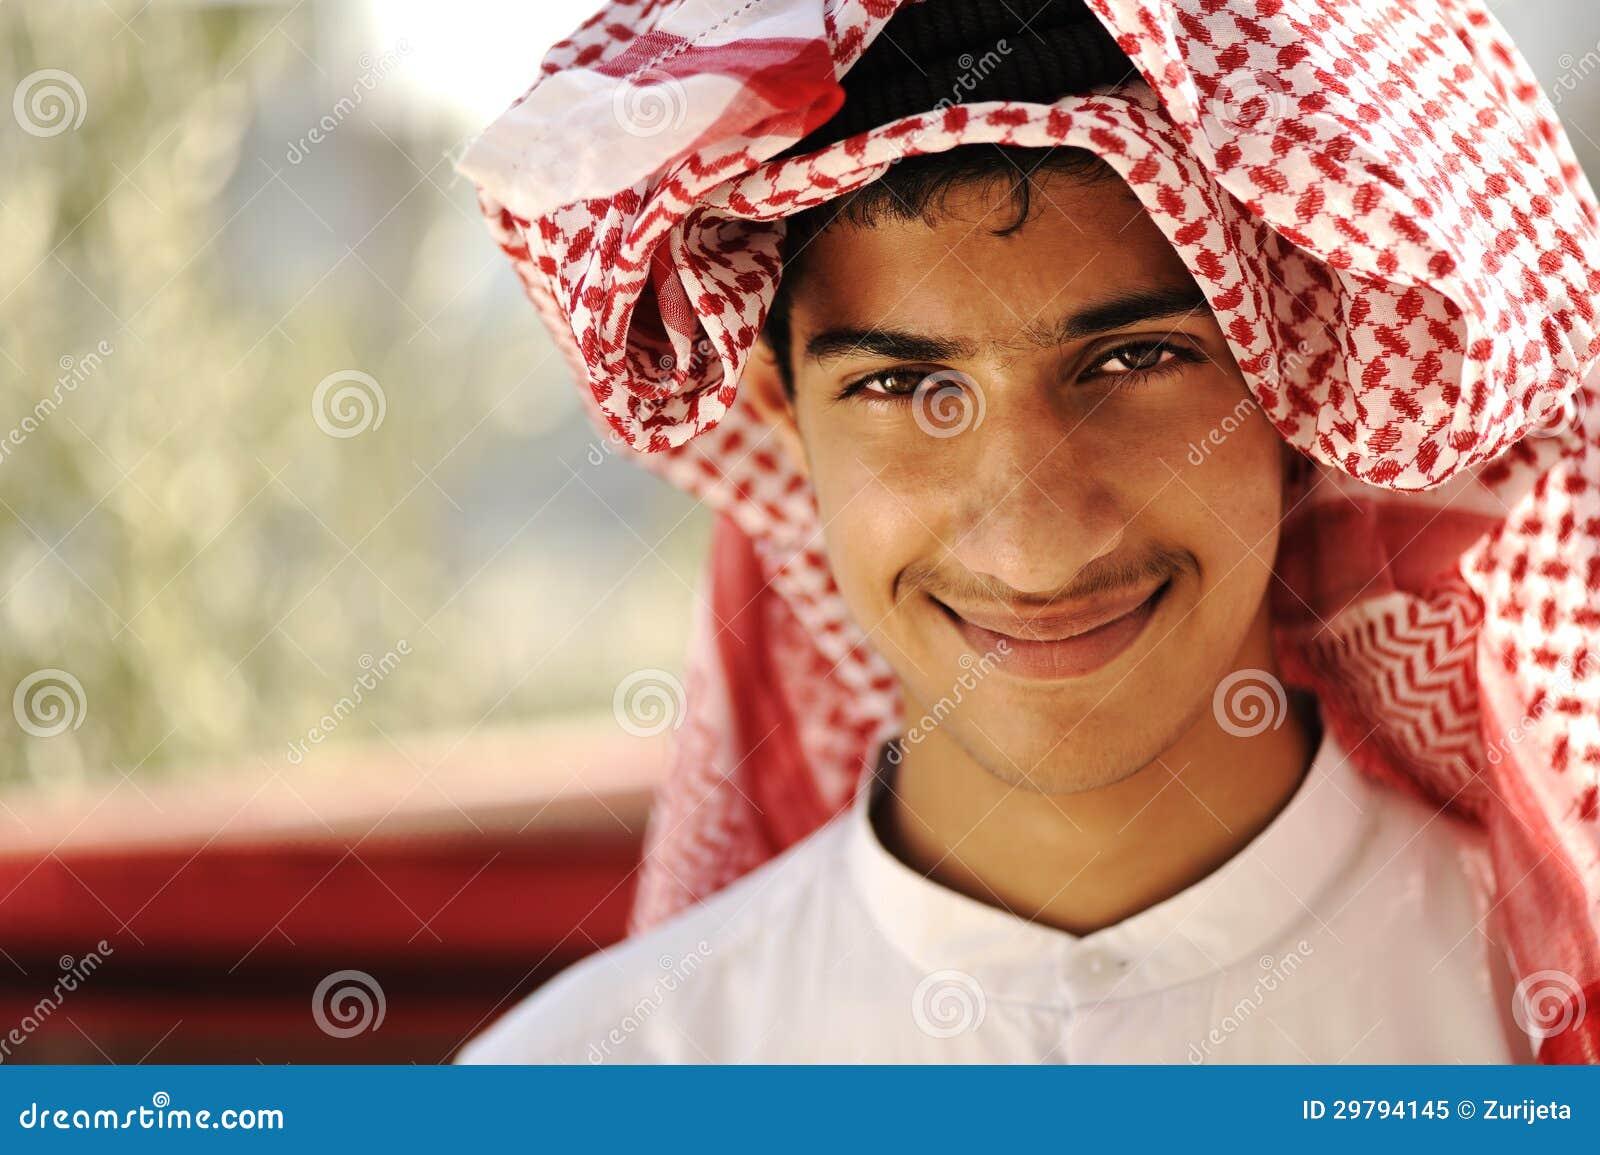 site de rencontre maghrebine et arabe